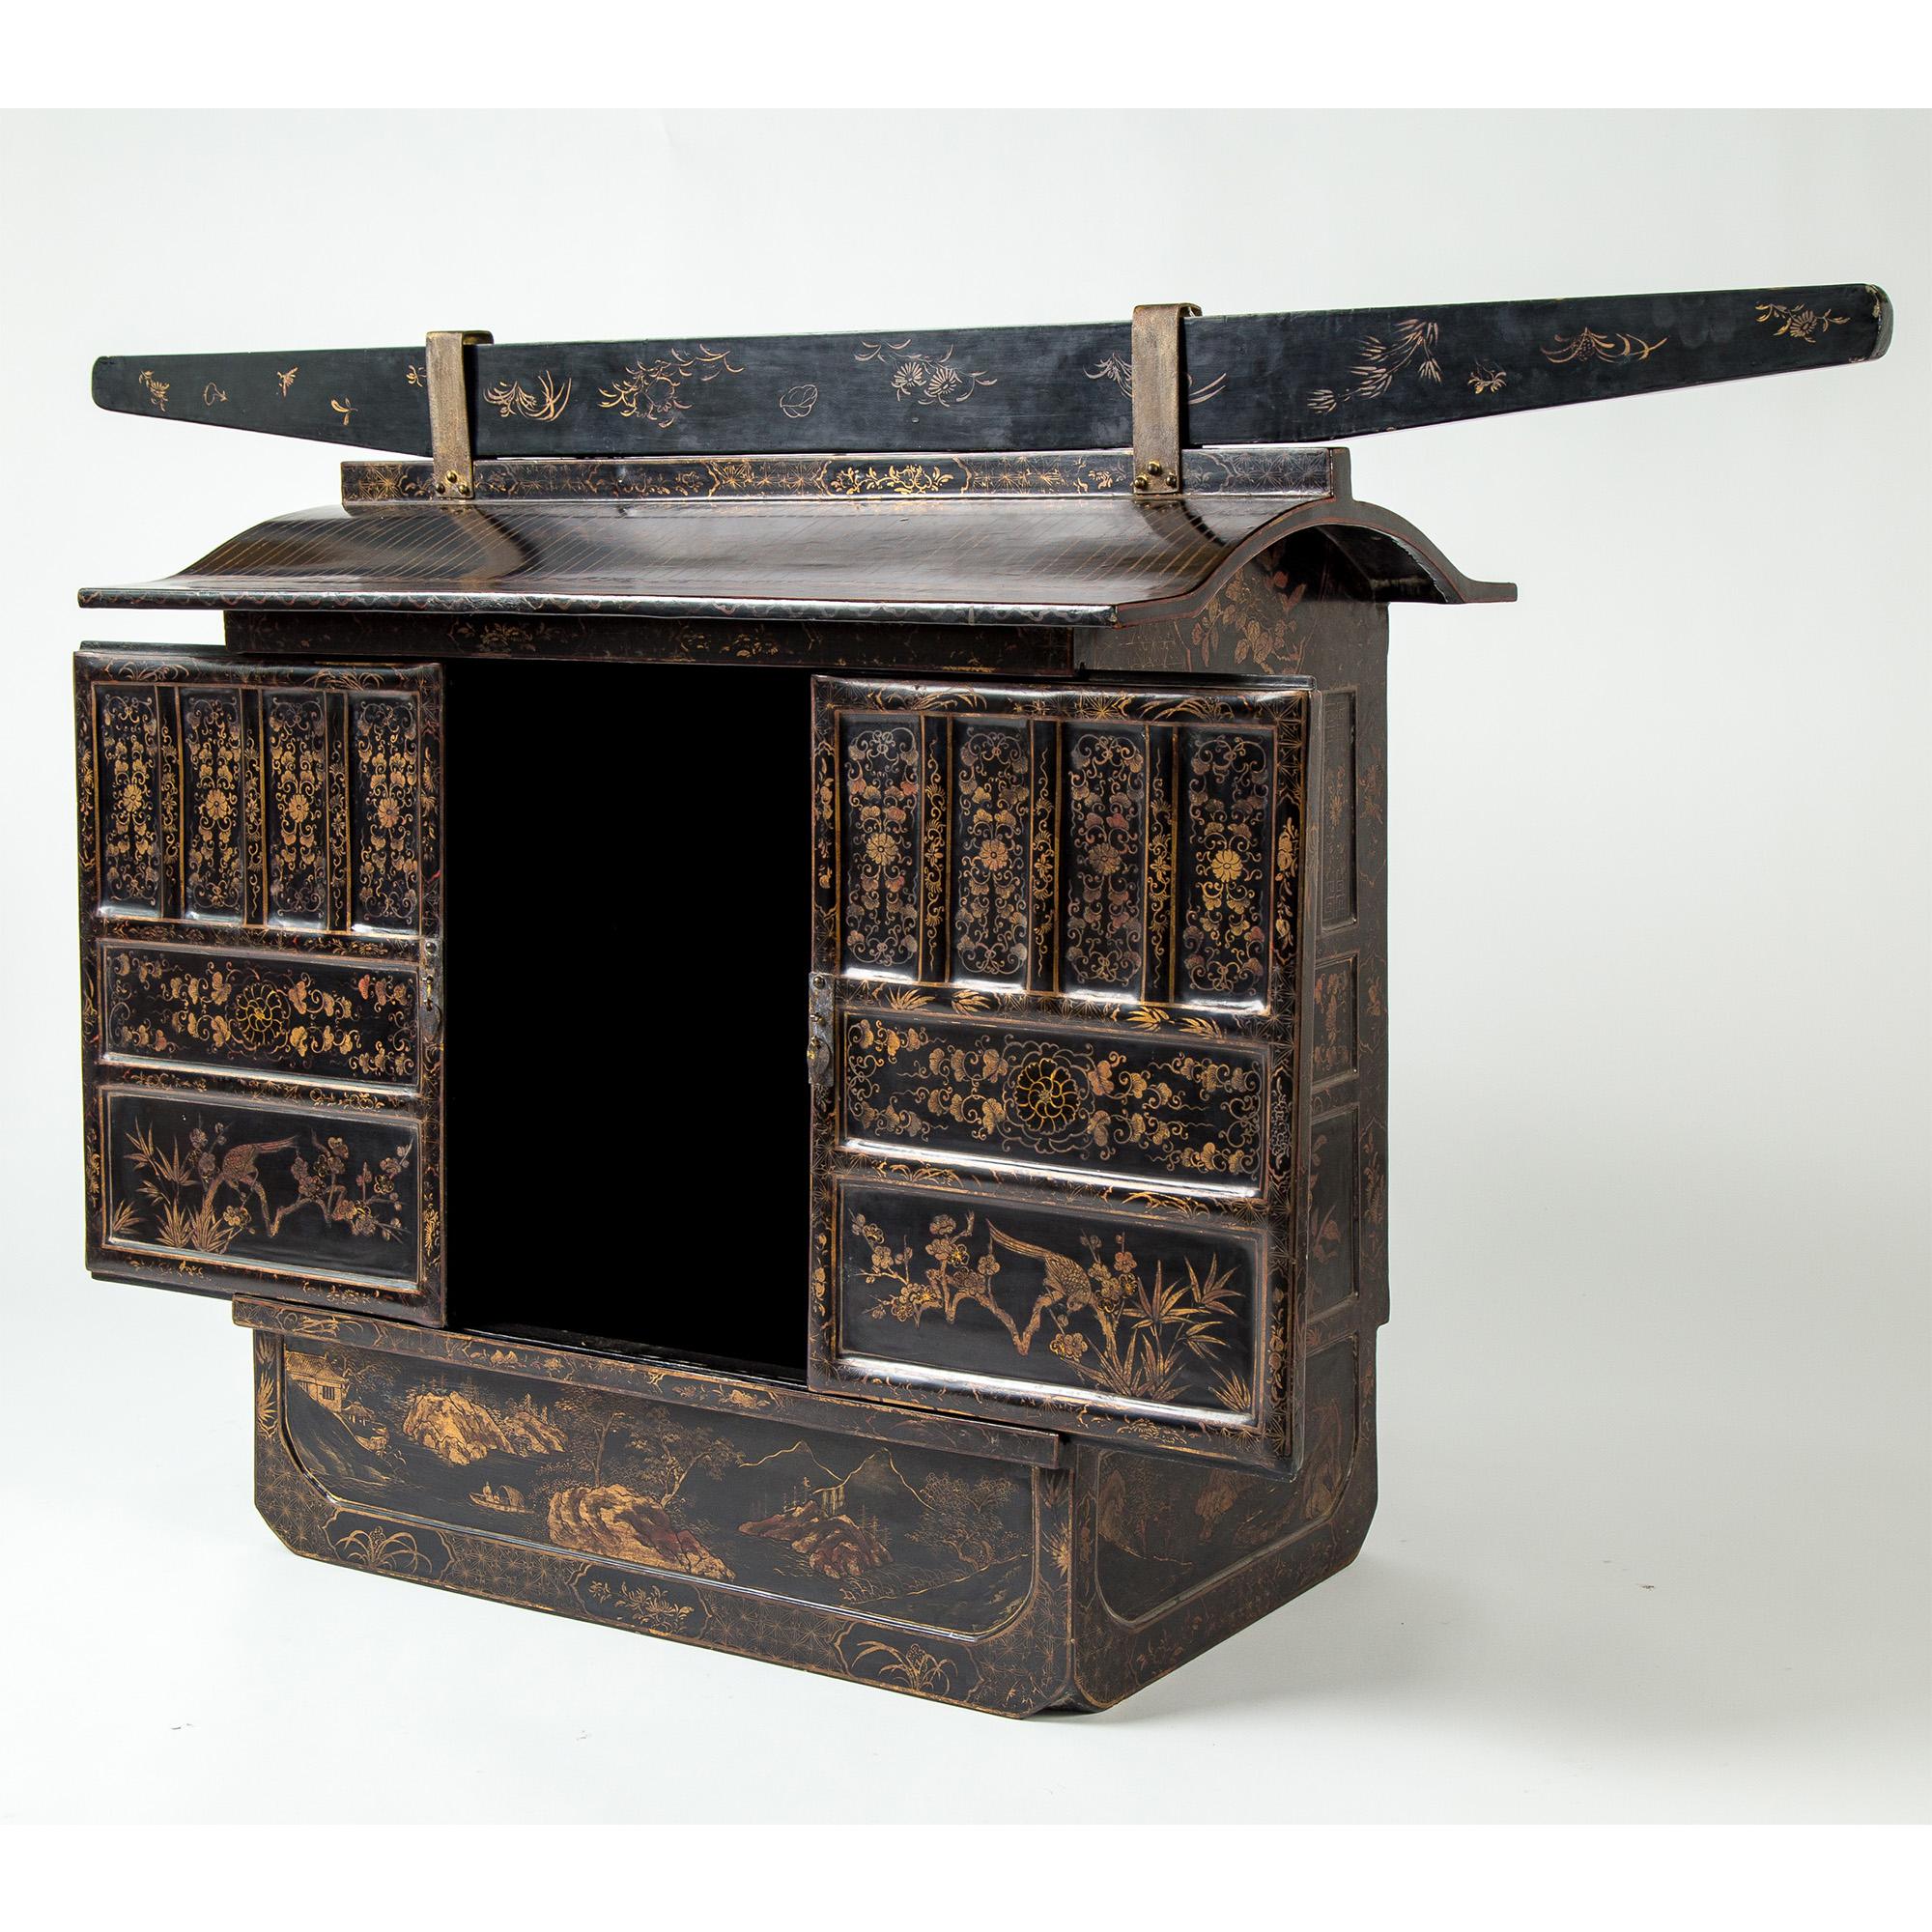 Furniture Images_Master 1_0008s_0004_IMG_4196.jpg